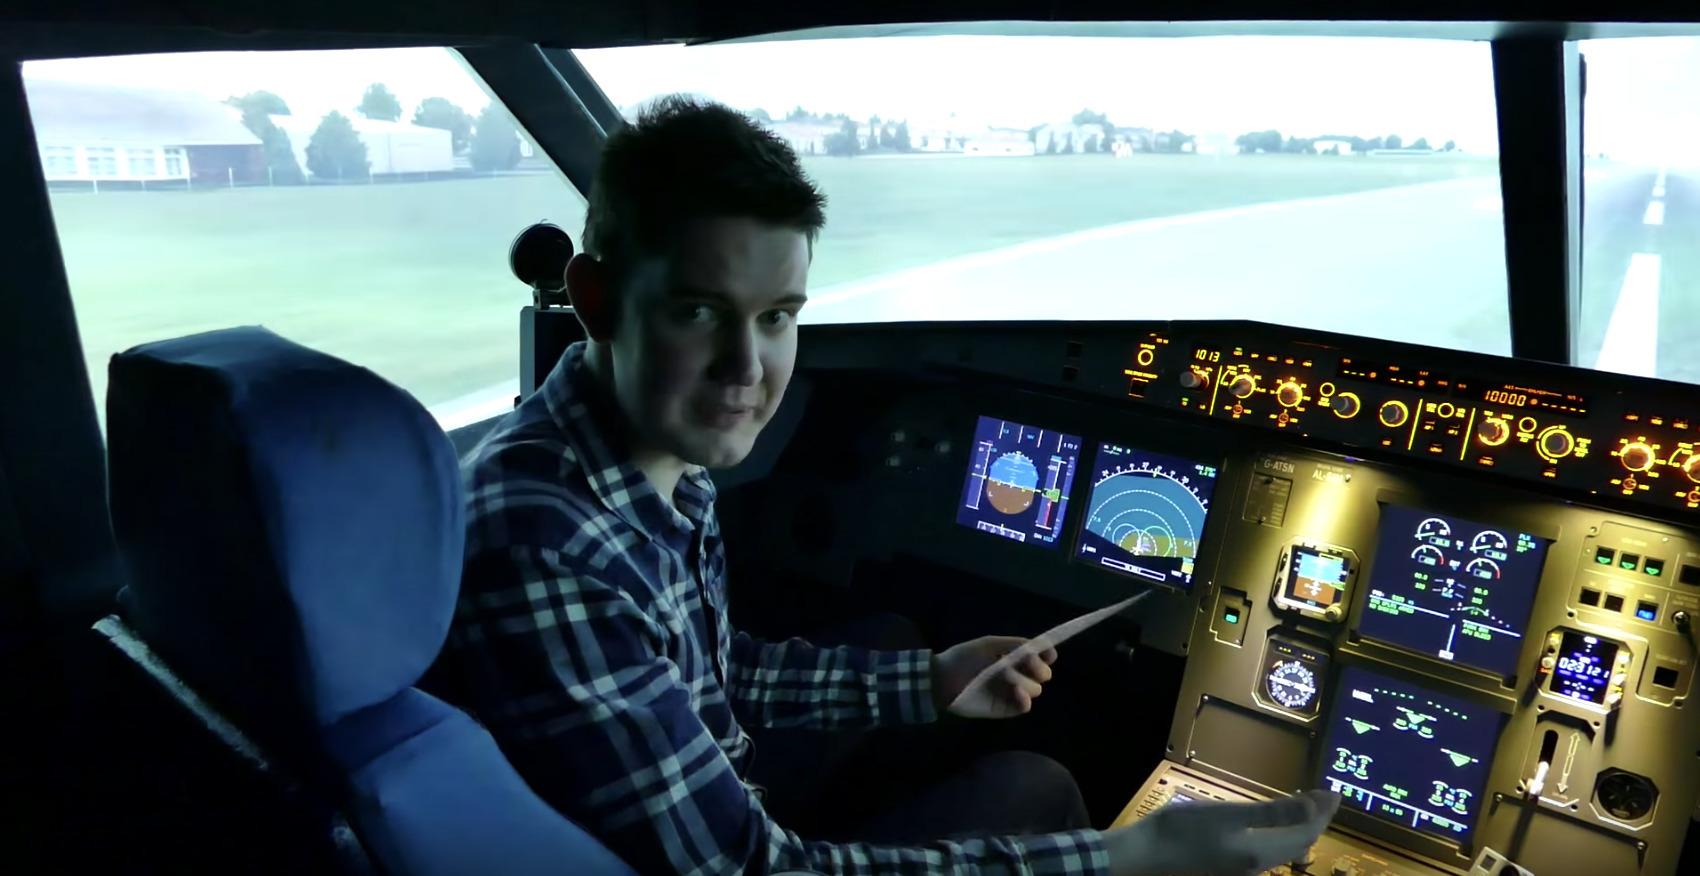 Flygcforumcom Plane Old Ben 3 Circuit Board Elite Miracle1 Gates